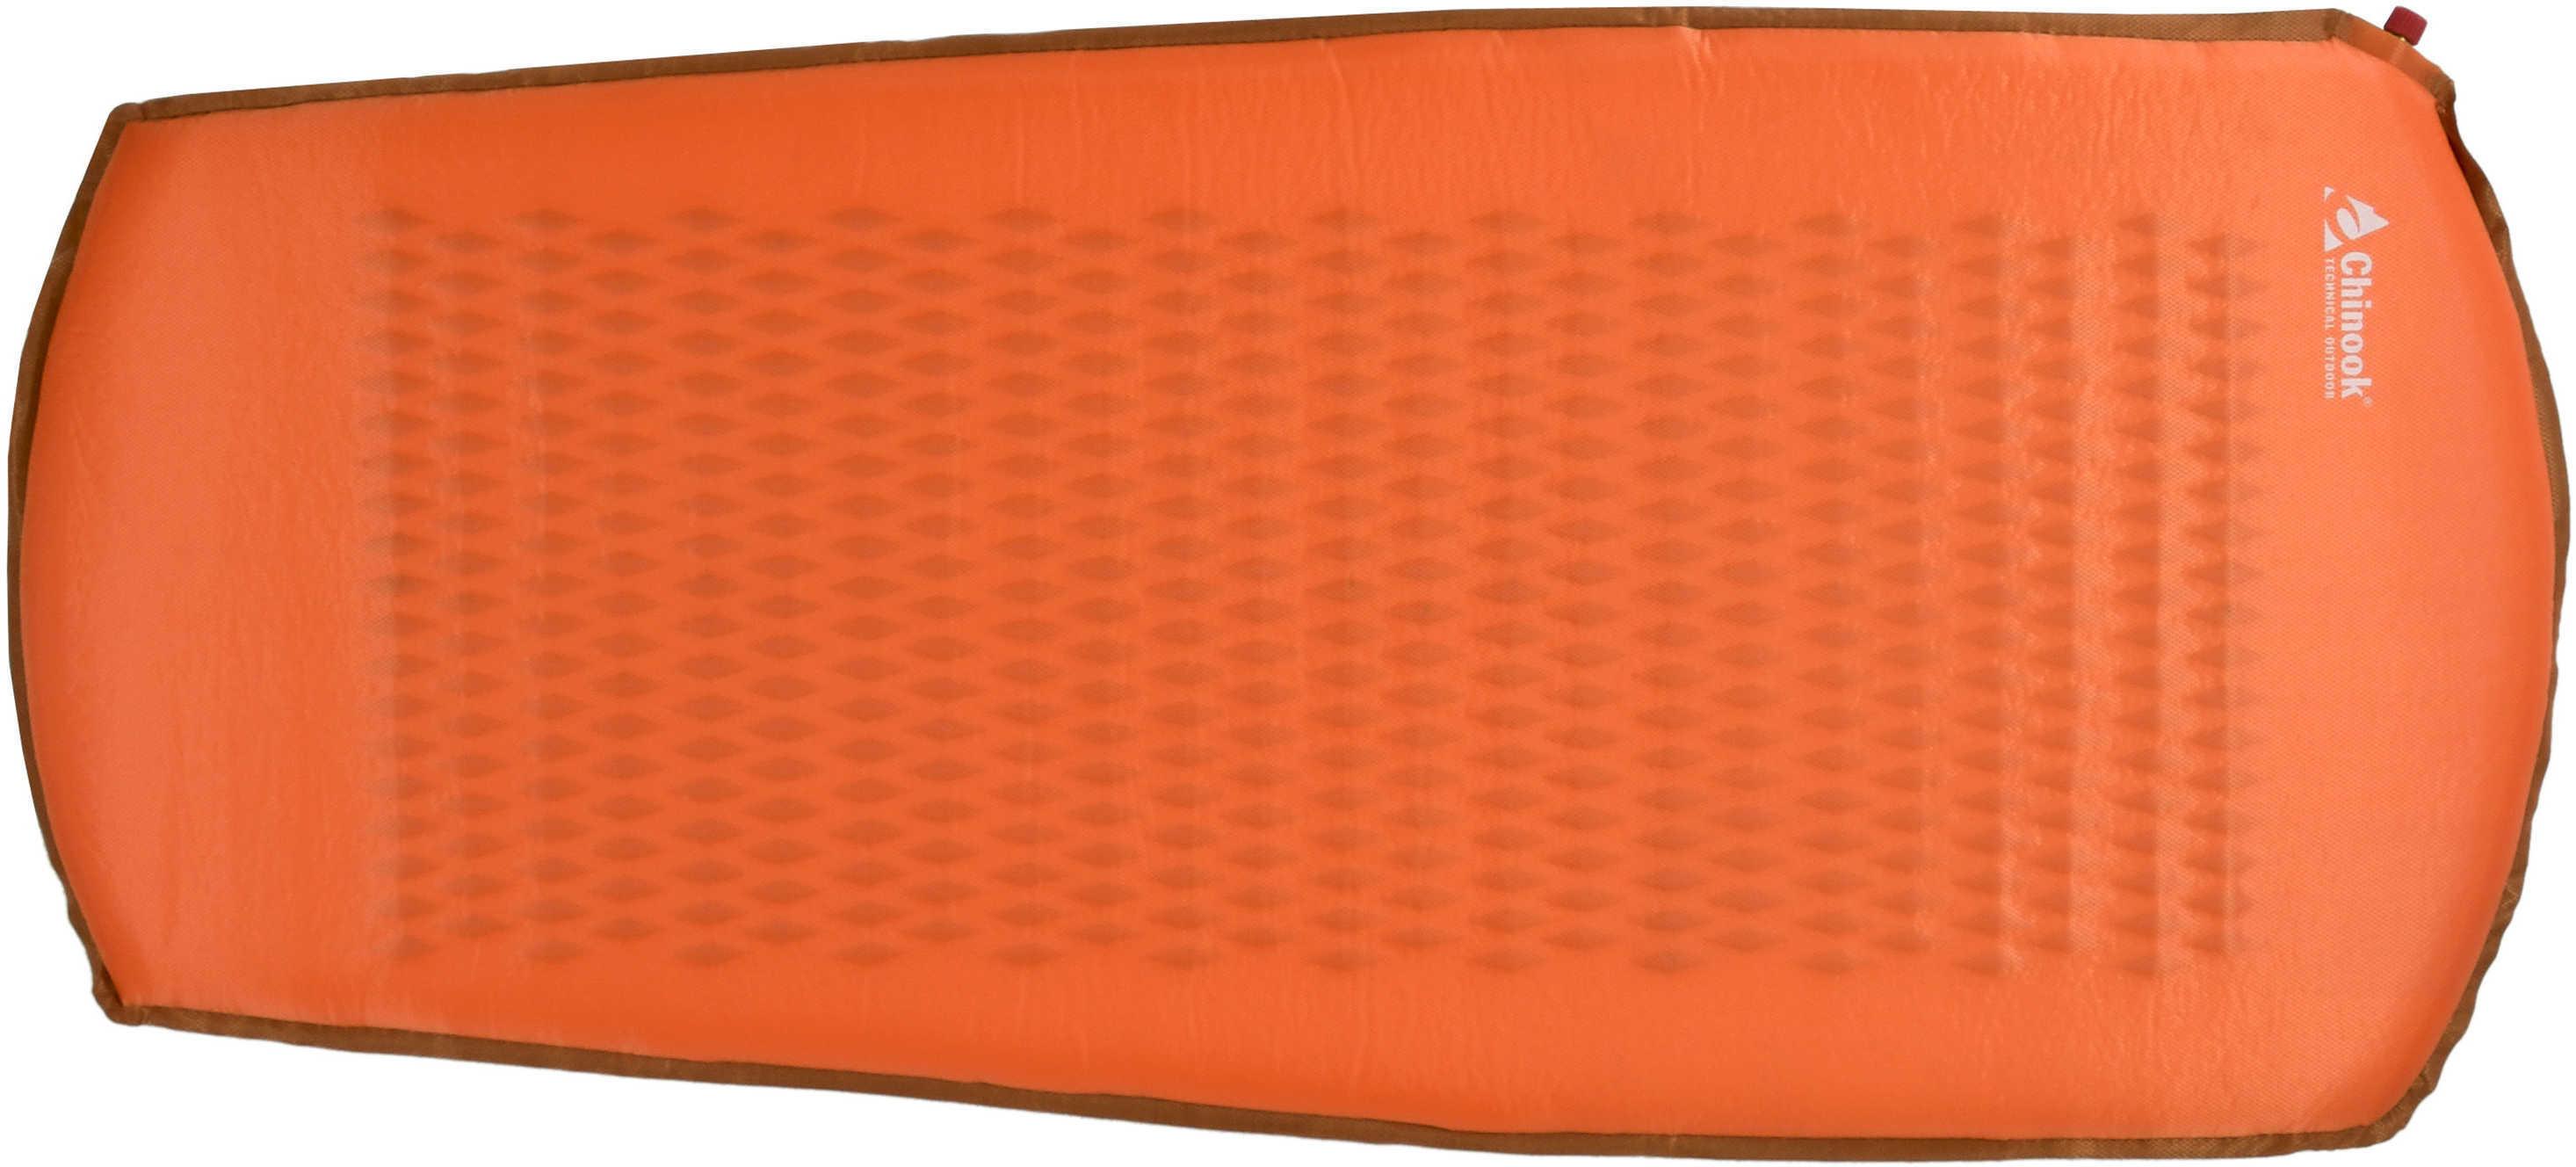 Guiderest Lite Mattress 48X20 Md: 23052